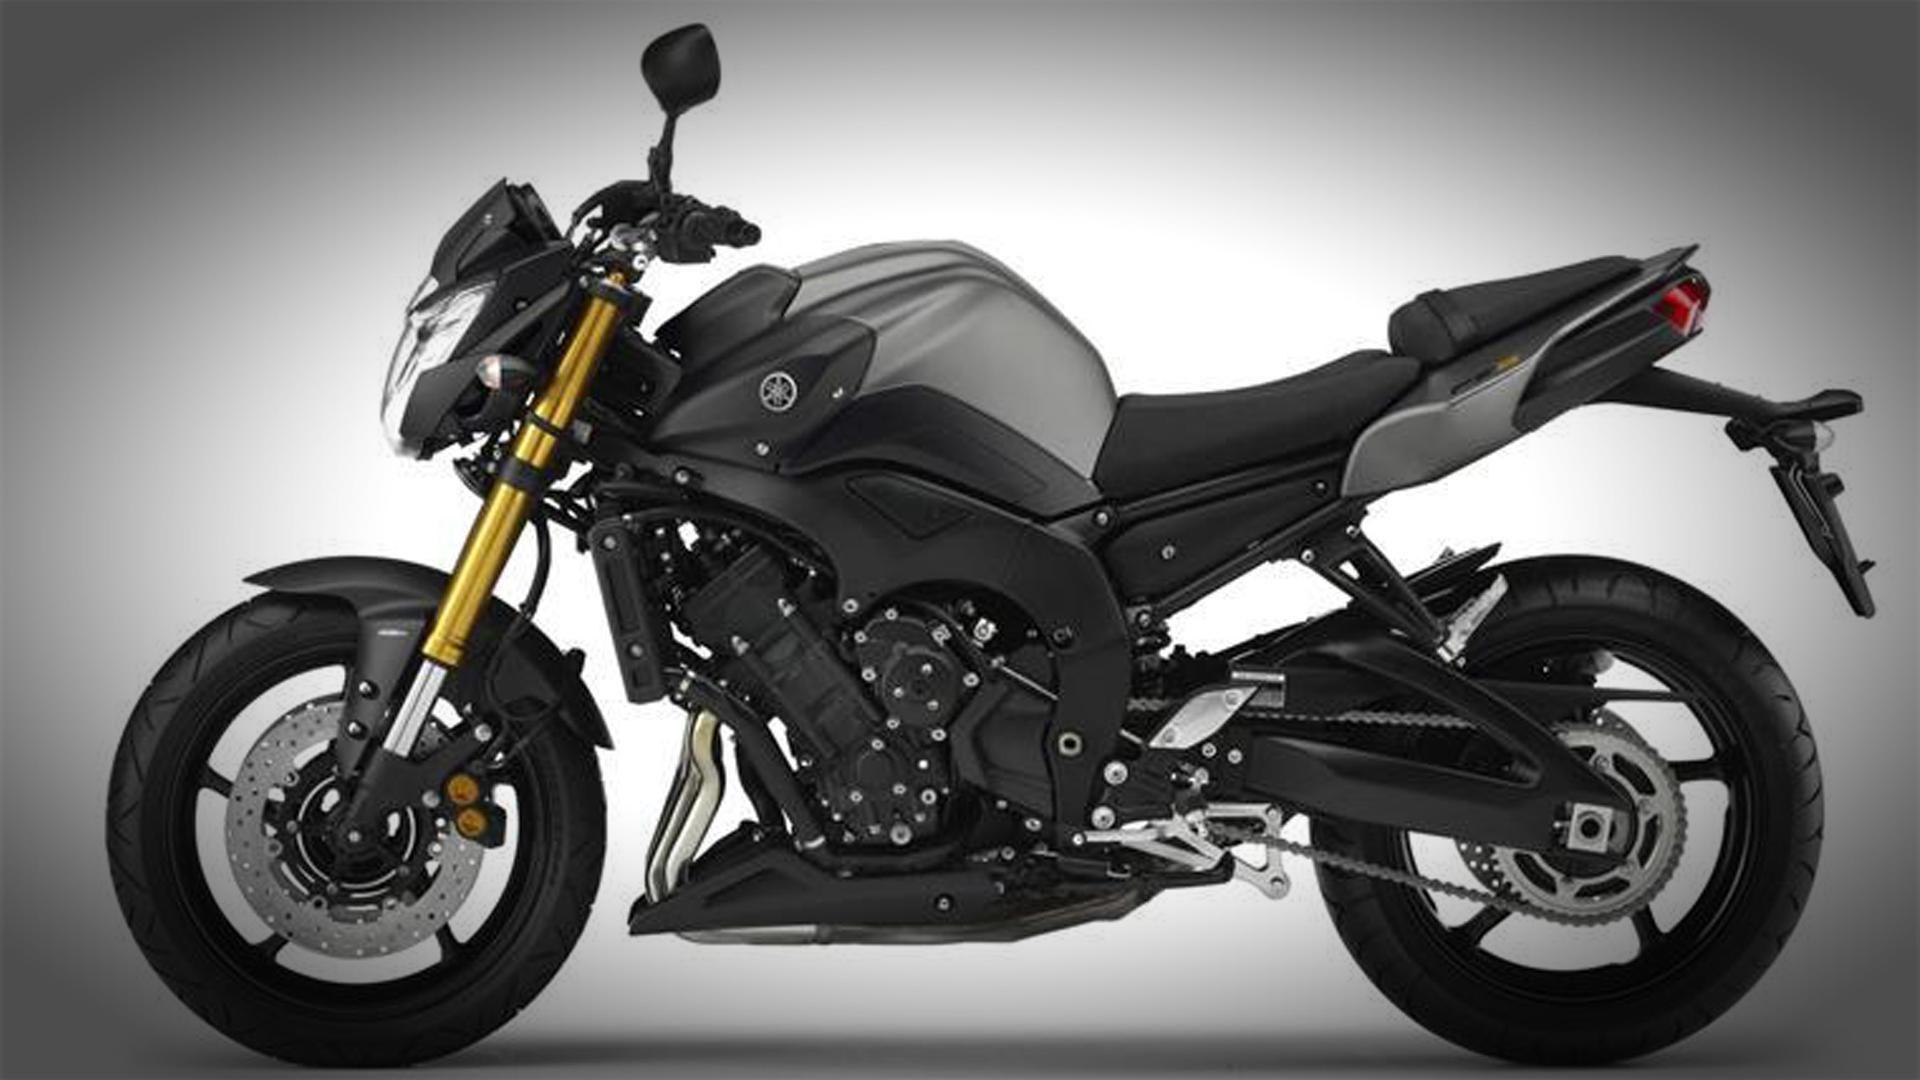 2014 Mv Agusta Brutale 675 Superbike Yamaha Motorcycle Bike